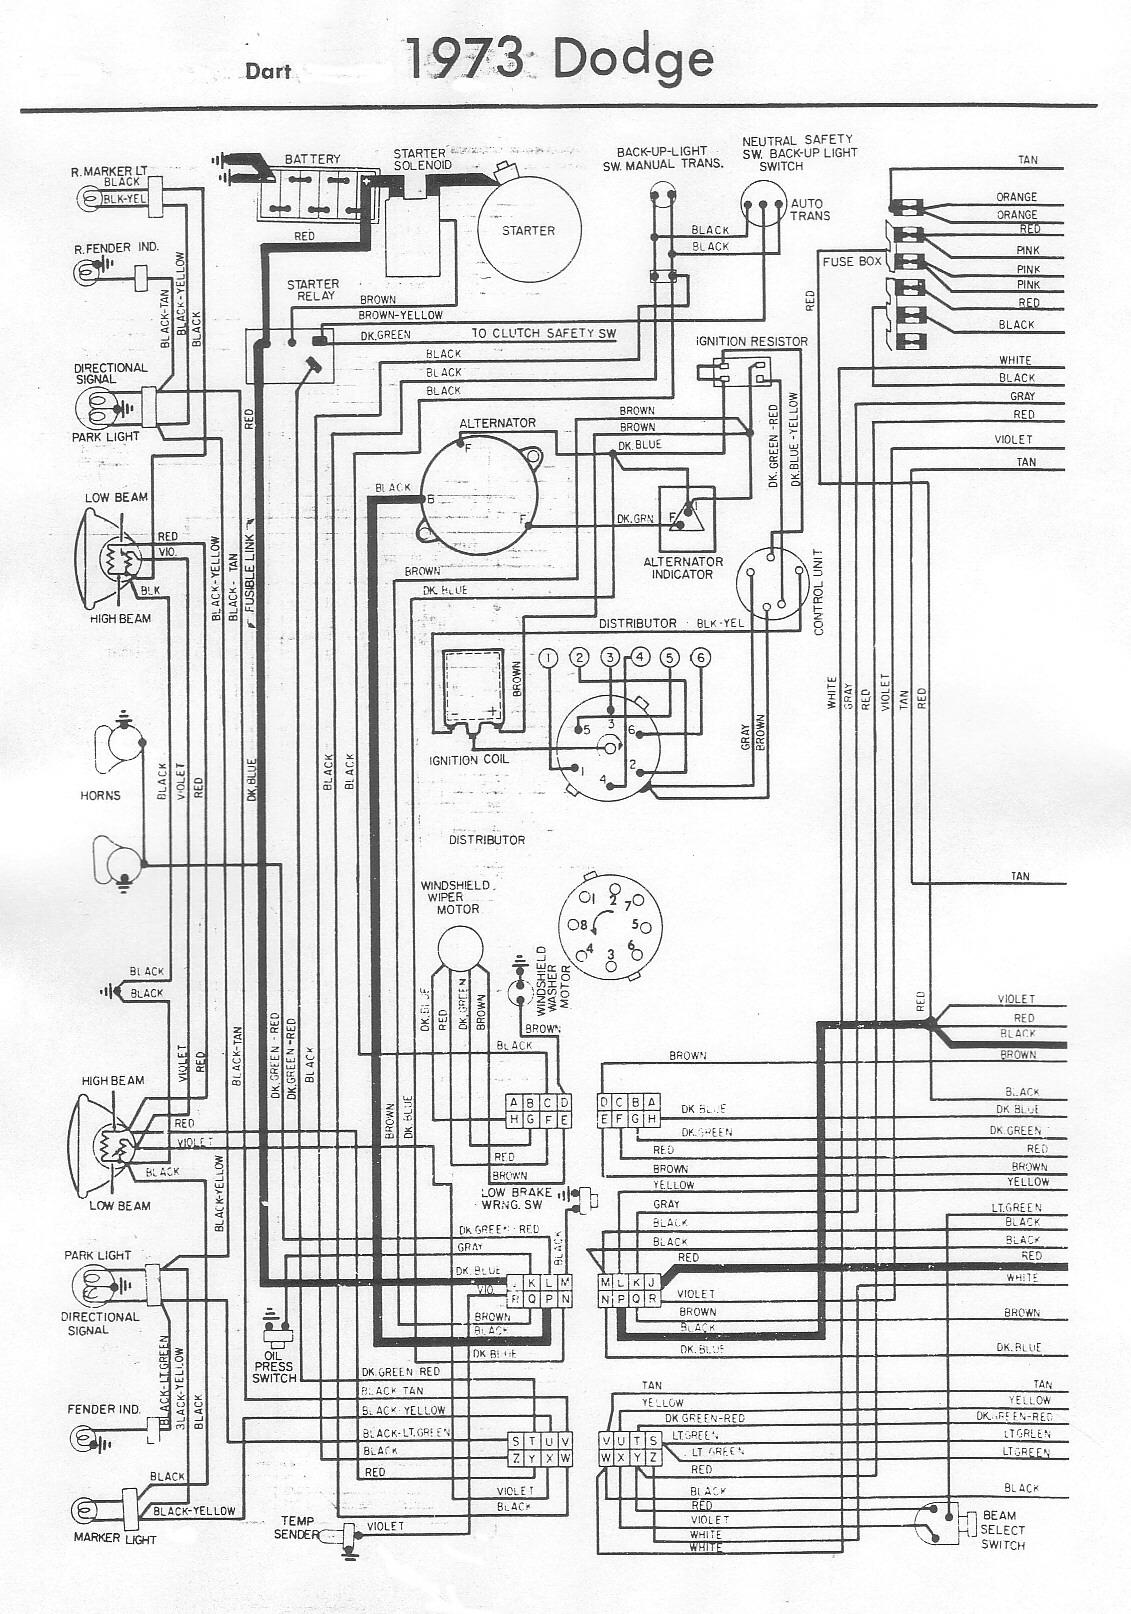 small resolution of 73 dodge dart wiring diagram wiring diagrams data 1973 dodge dart engine wiring harness 1973 dodge dart wiring harness